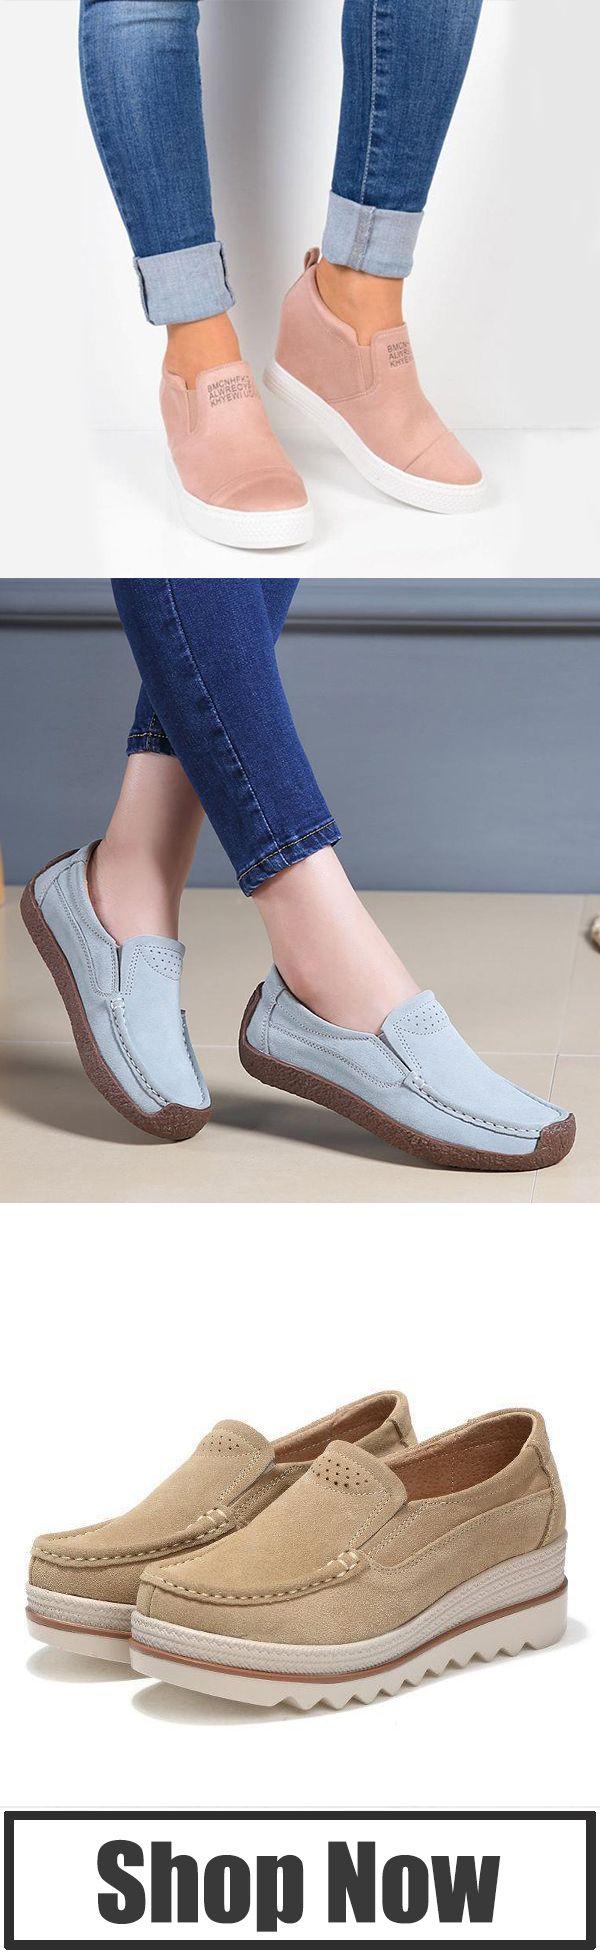 Women Casual Comfy Non-slip Shoes